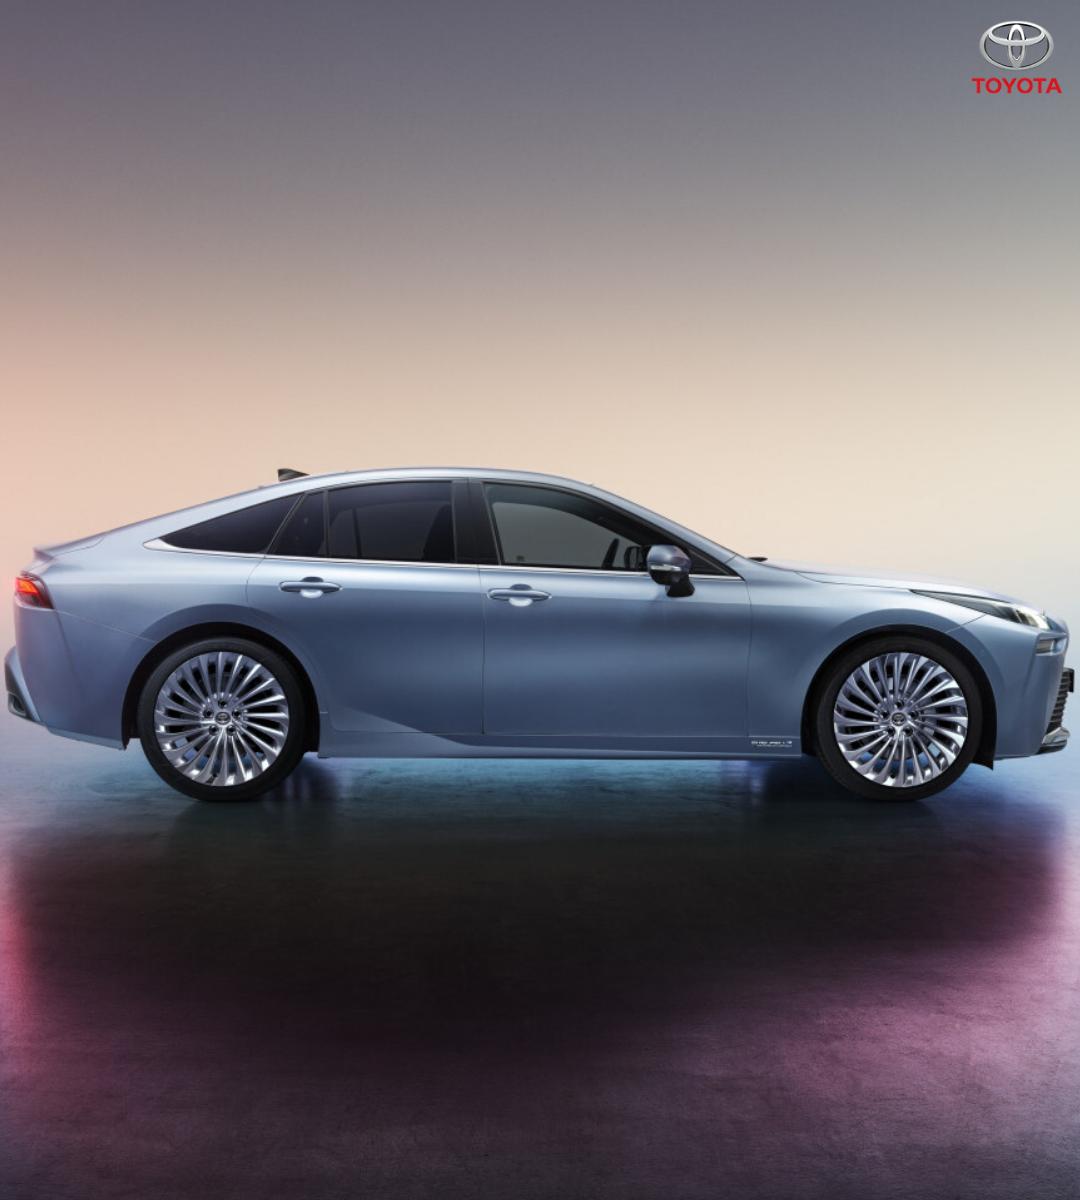 Pin on New Toyota Mirai Hydrogen Fuel Cell Car